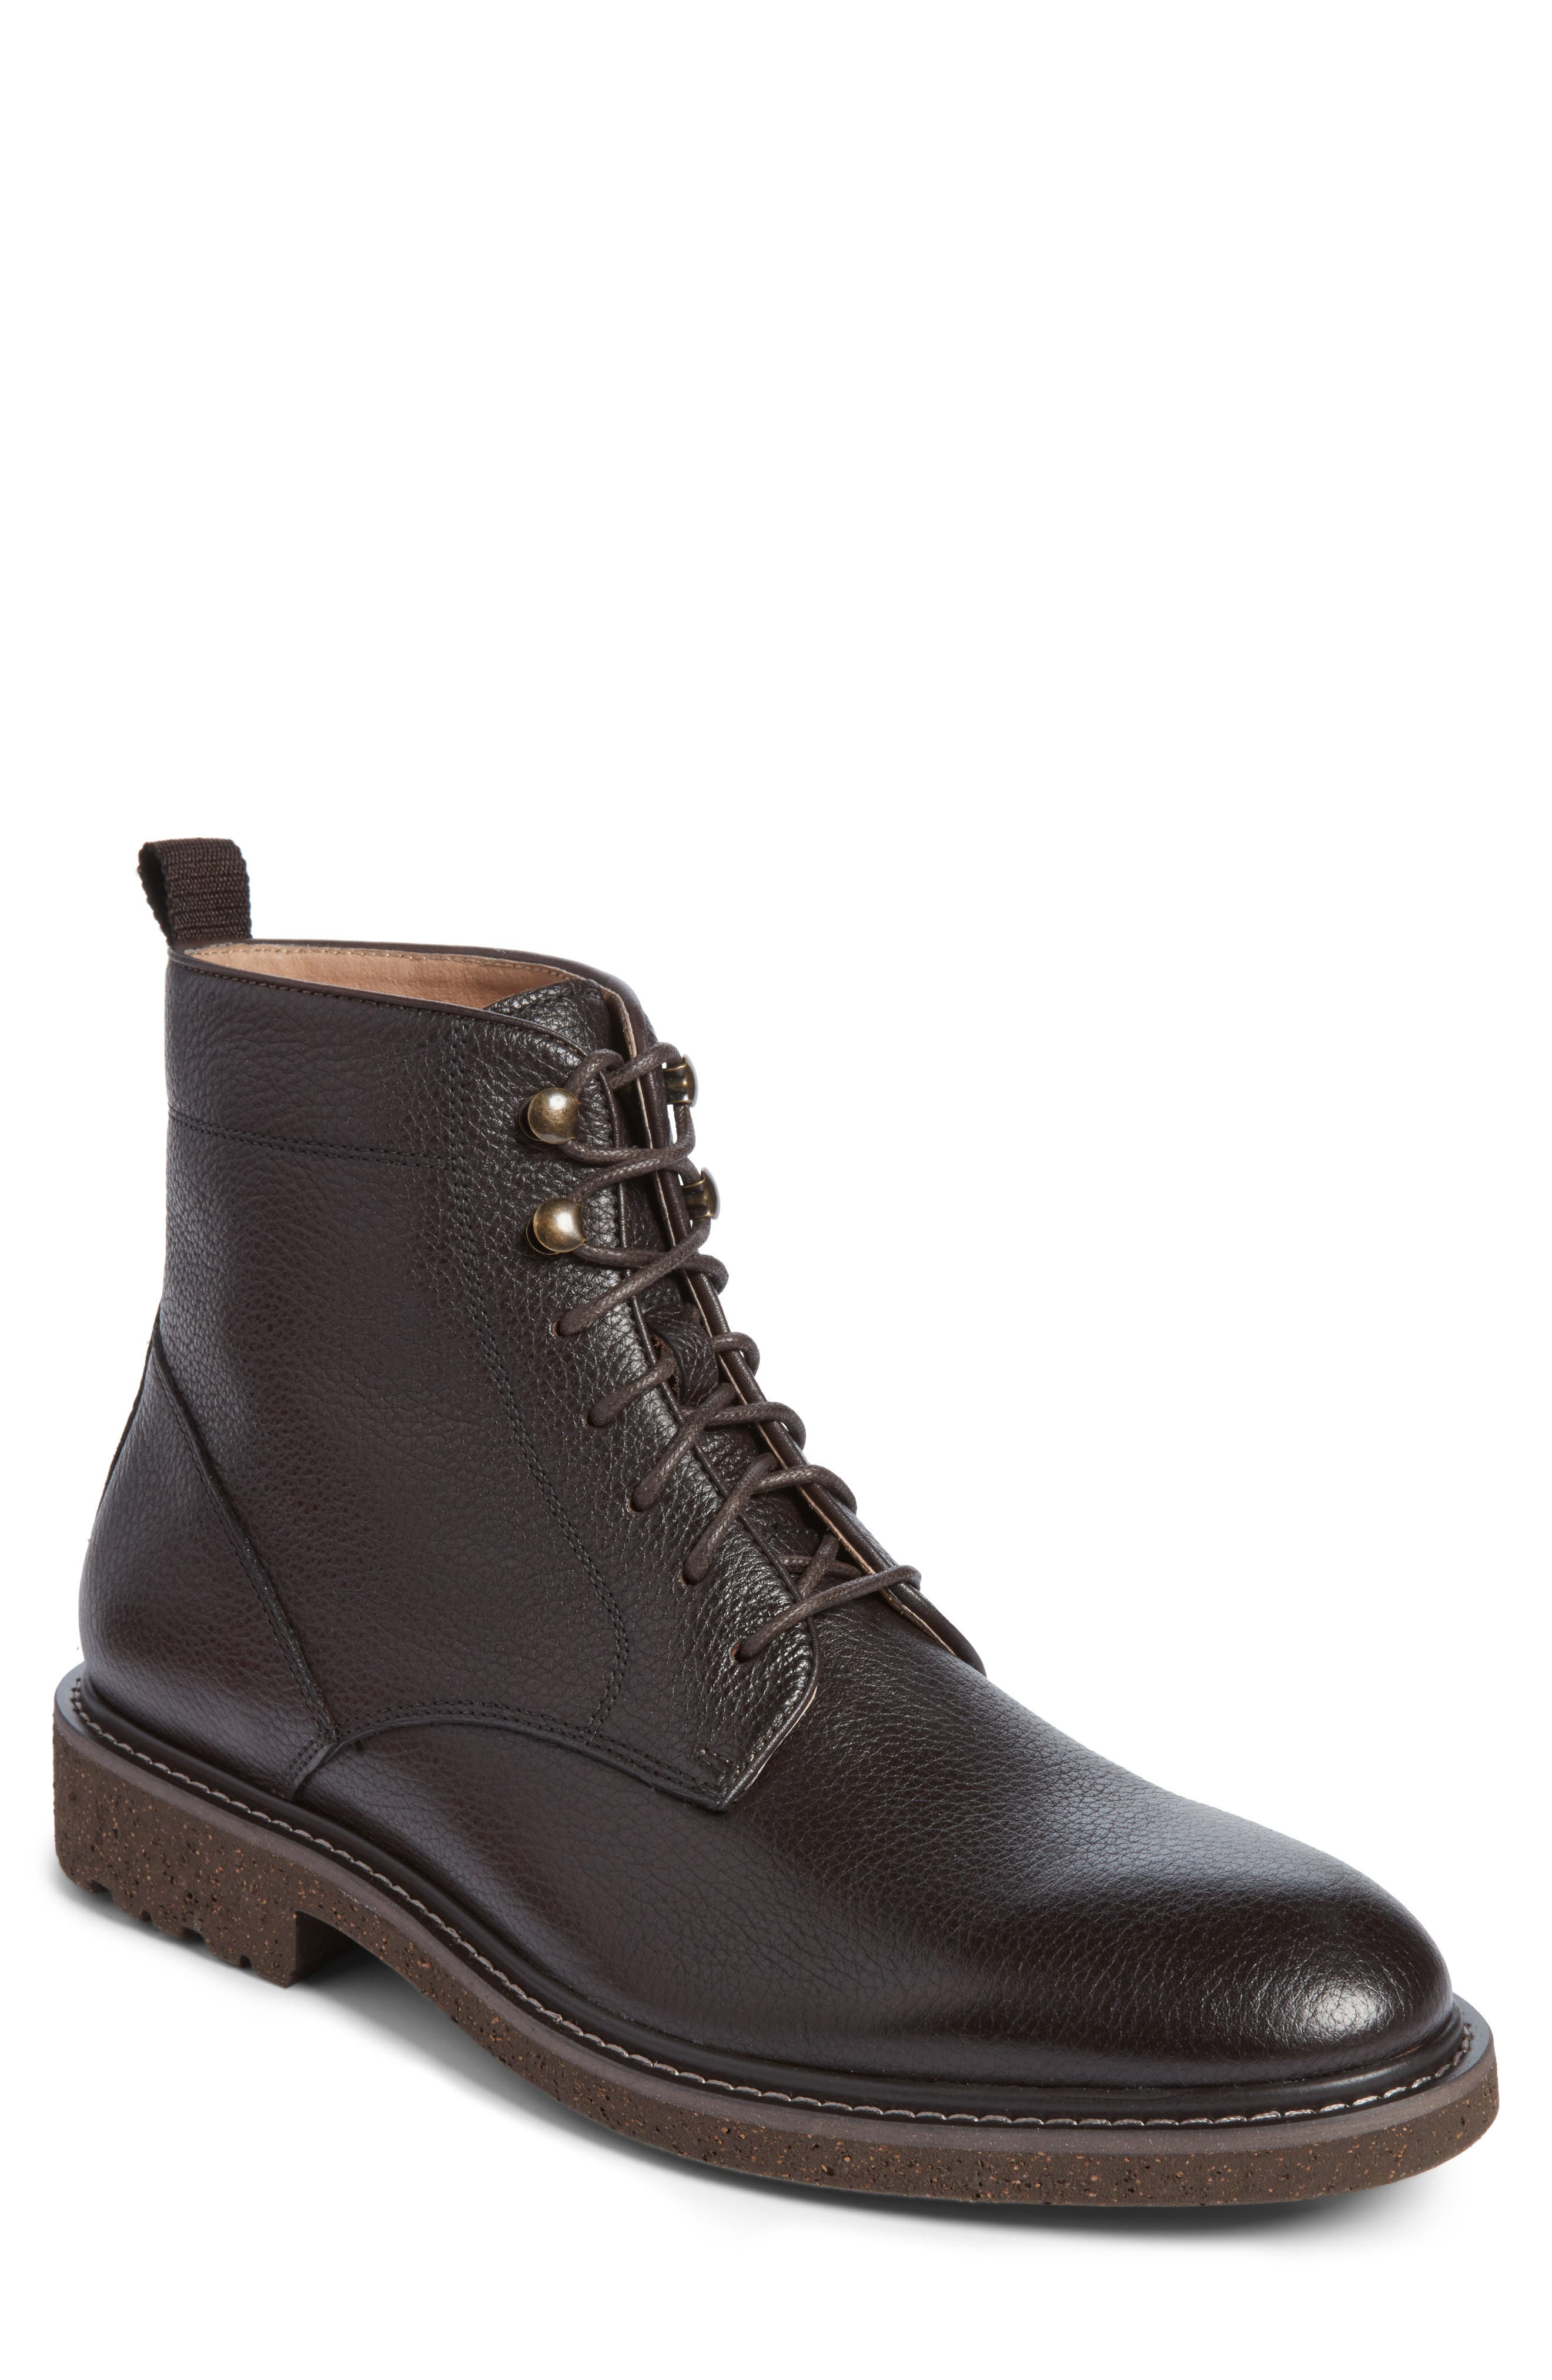 Trenton Plain Toe Boot,                         Main,                         color, 200